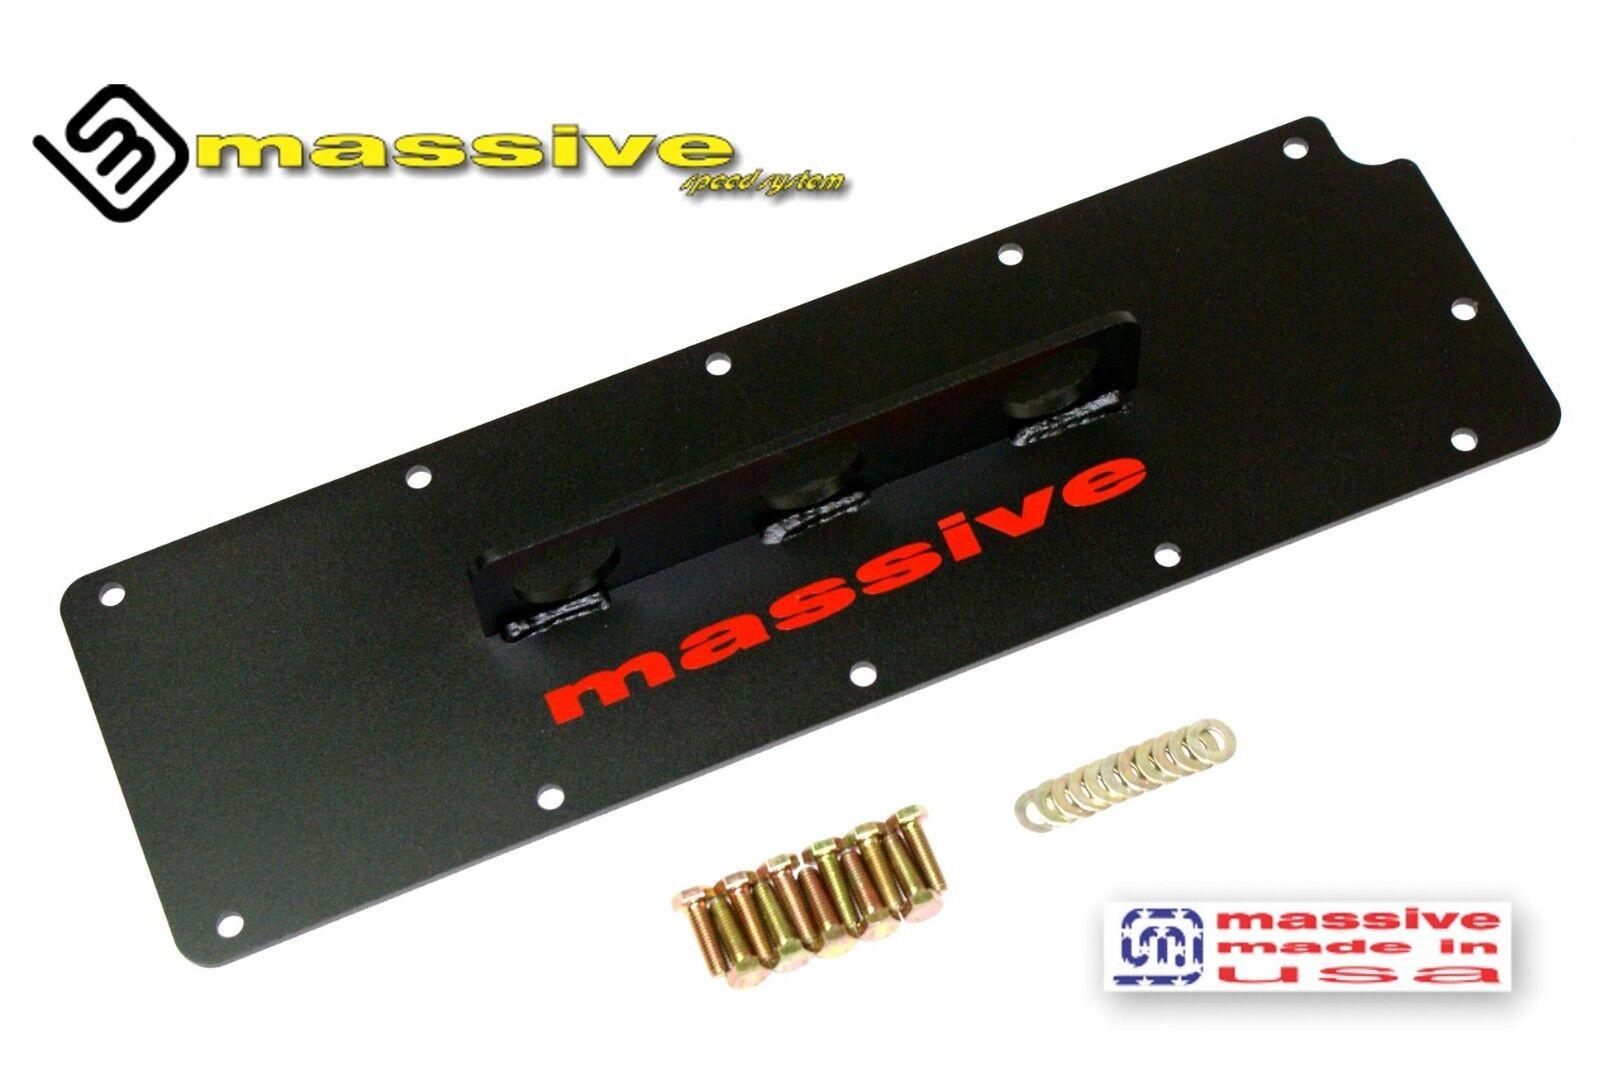 AK Garage LS LSX Series Engine Hoist Lift Plate LS LS1 LS2 LS3 LQ4 6.0 6.2 5.3 4.8 Gen III